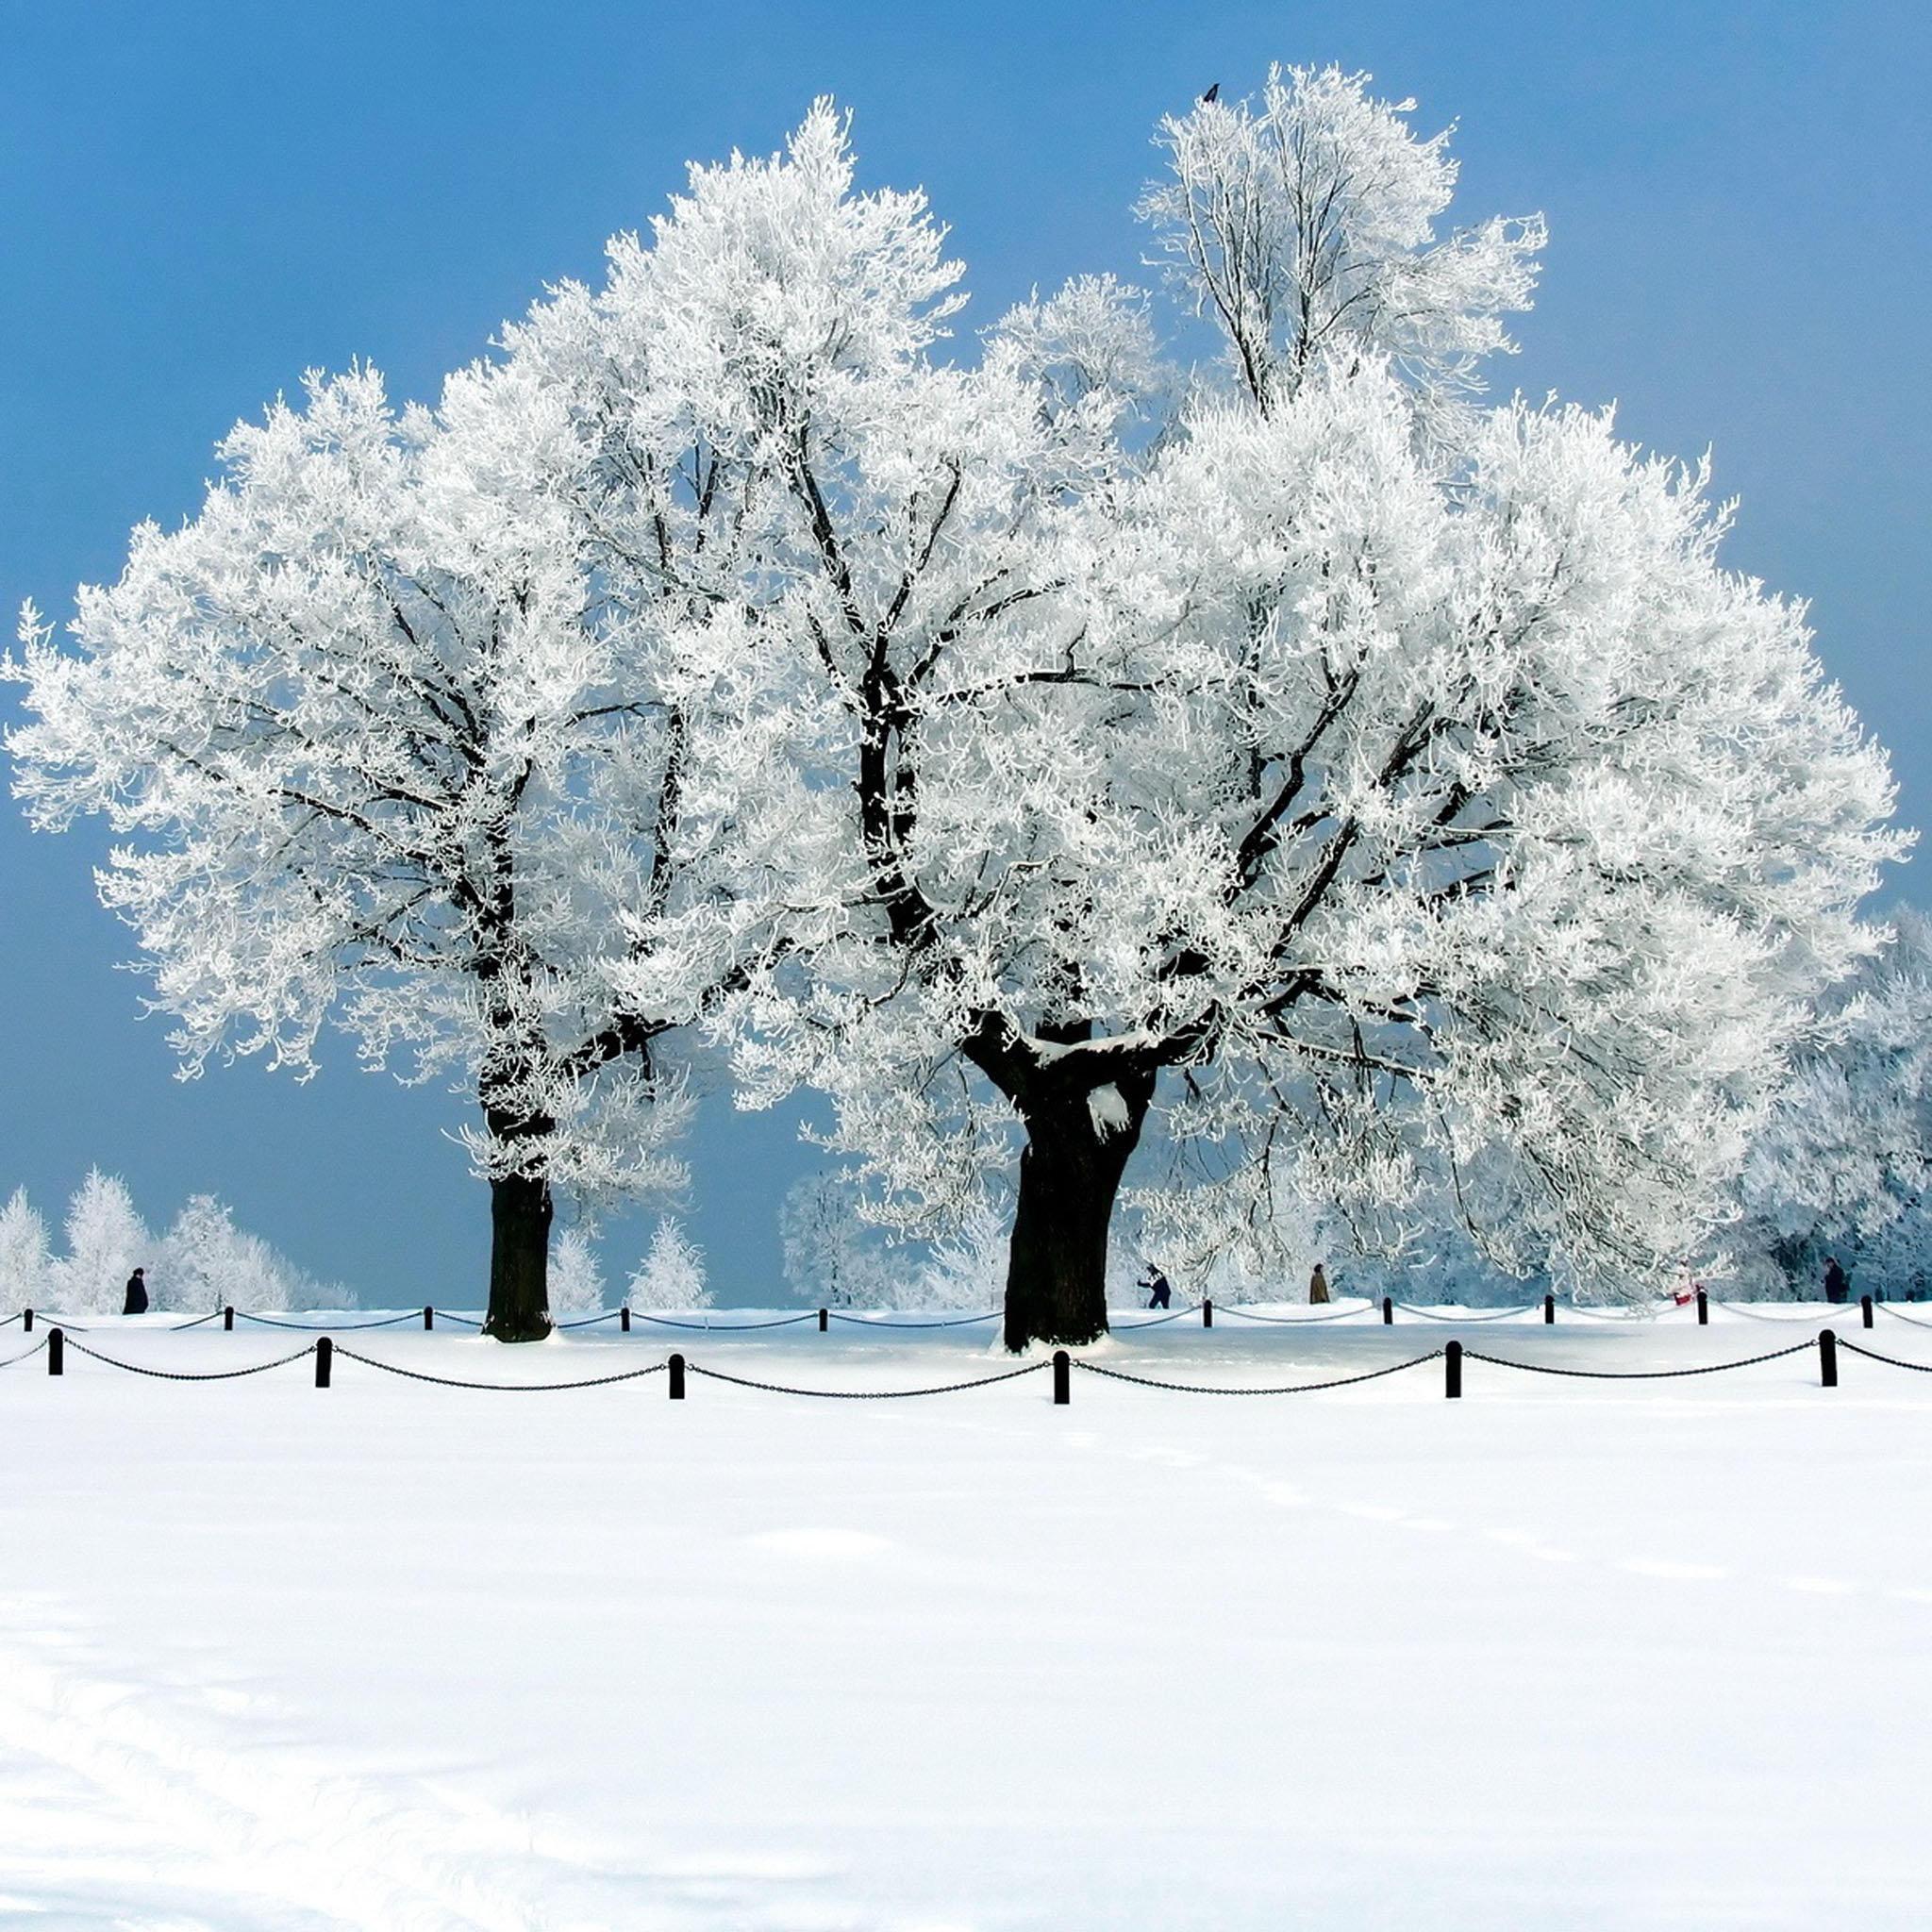 Winter Wallpaper: Beautiful Winter Wallpapers For IPads